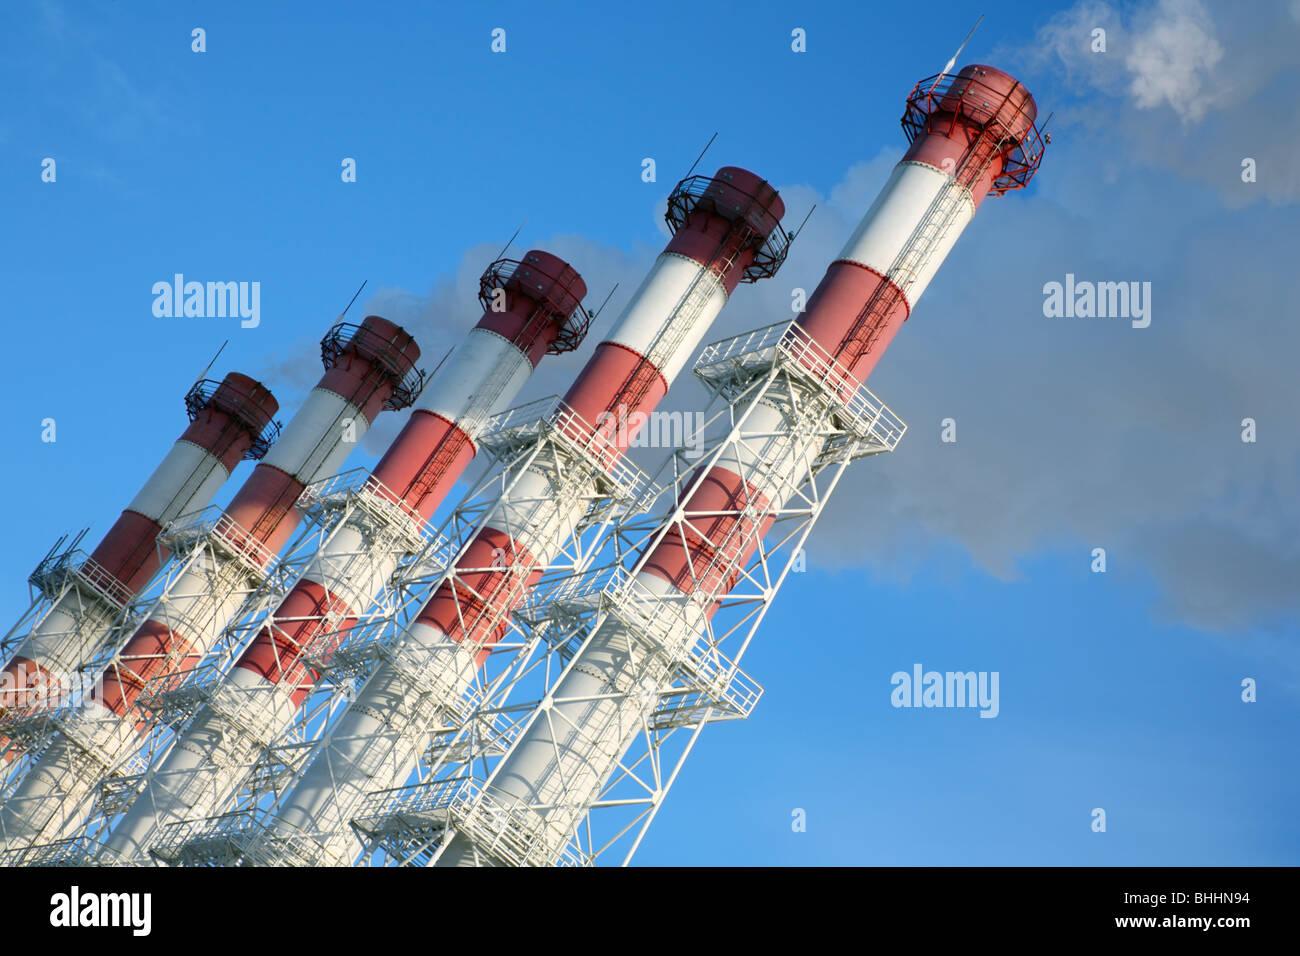 Cinco chimeneas con vapor sobre un fondo de cielo azul. Inclinar la vista. Imagen De Stock